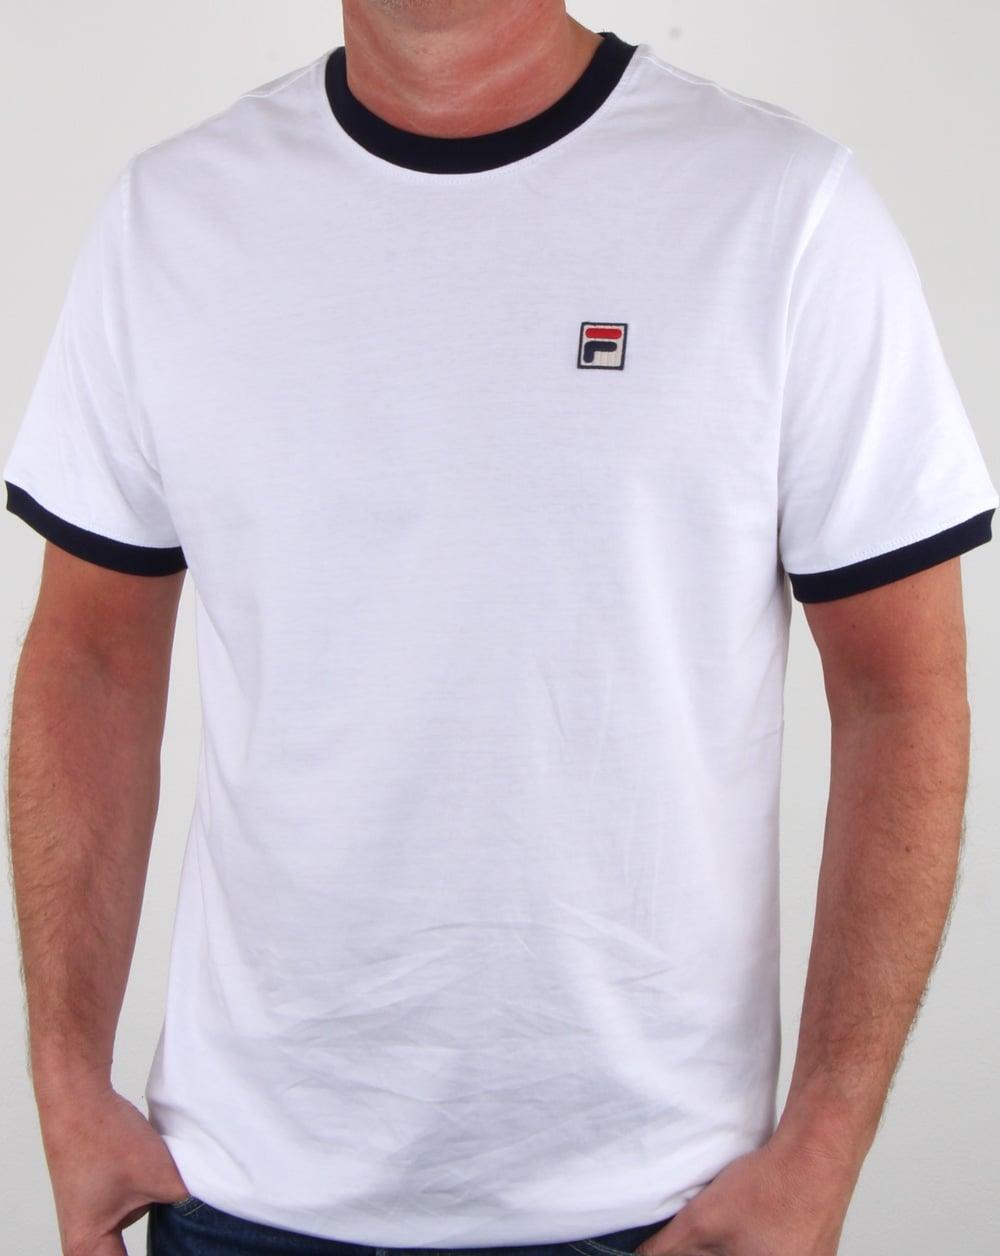 574fdf64 Fila Vintage Ringer T-shirt White,marconi,tee,mens